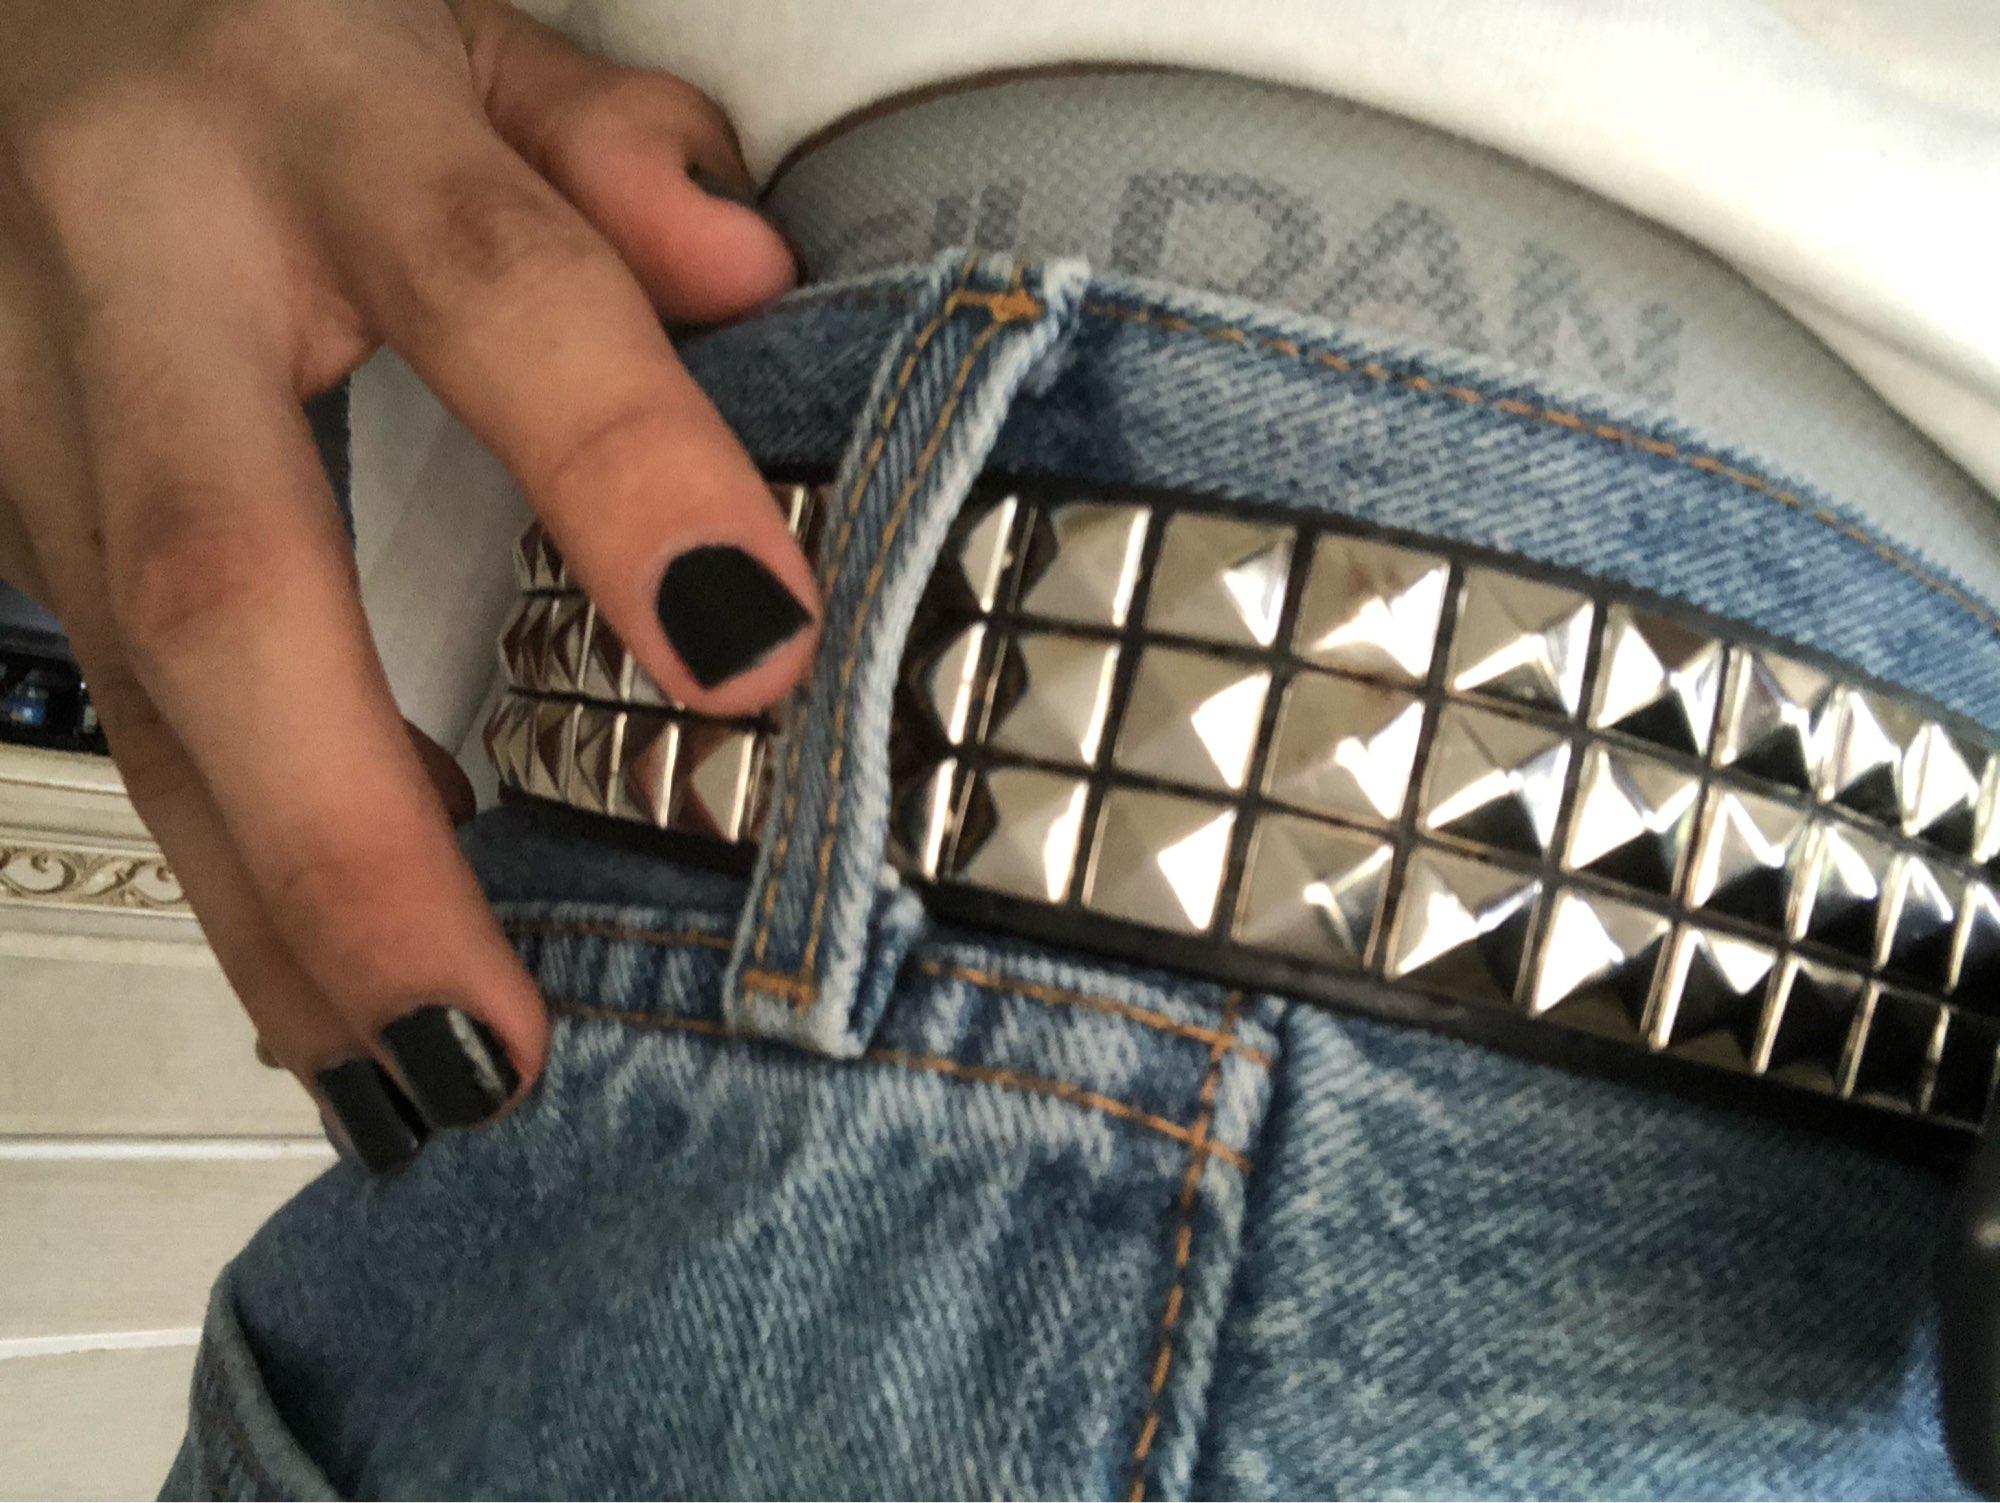 Egirl Eboy Punk Belt with Pyramid shape Rivets photo review